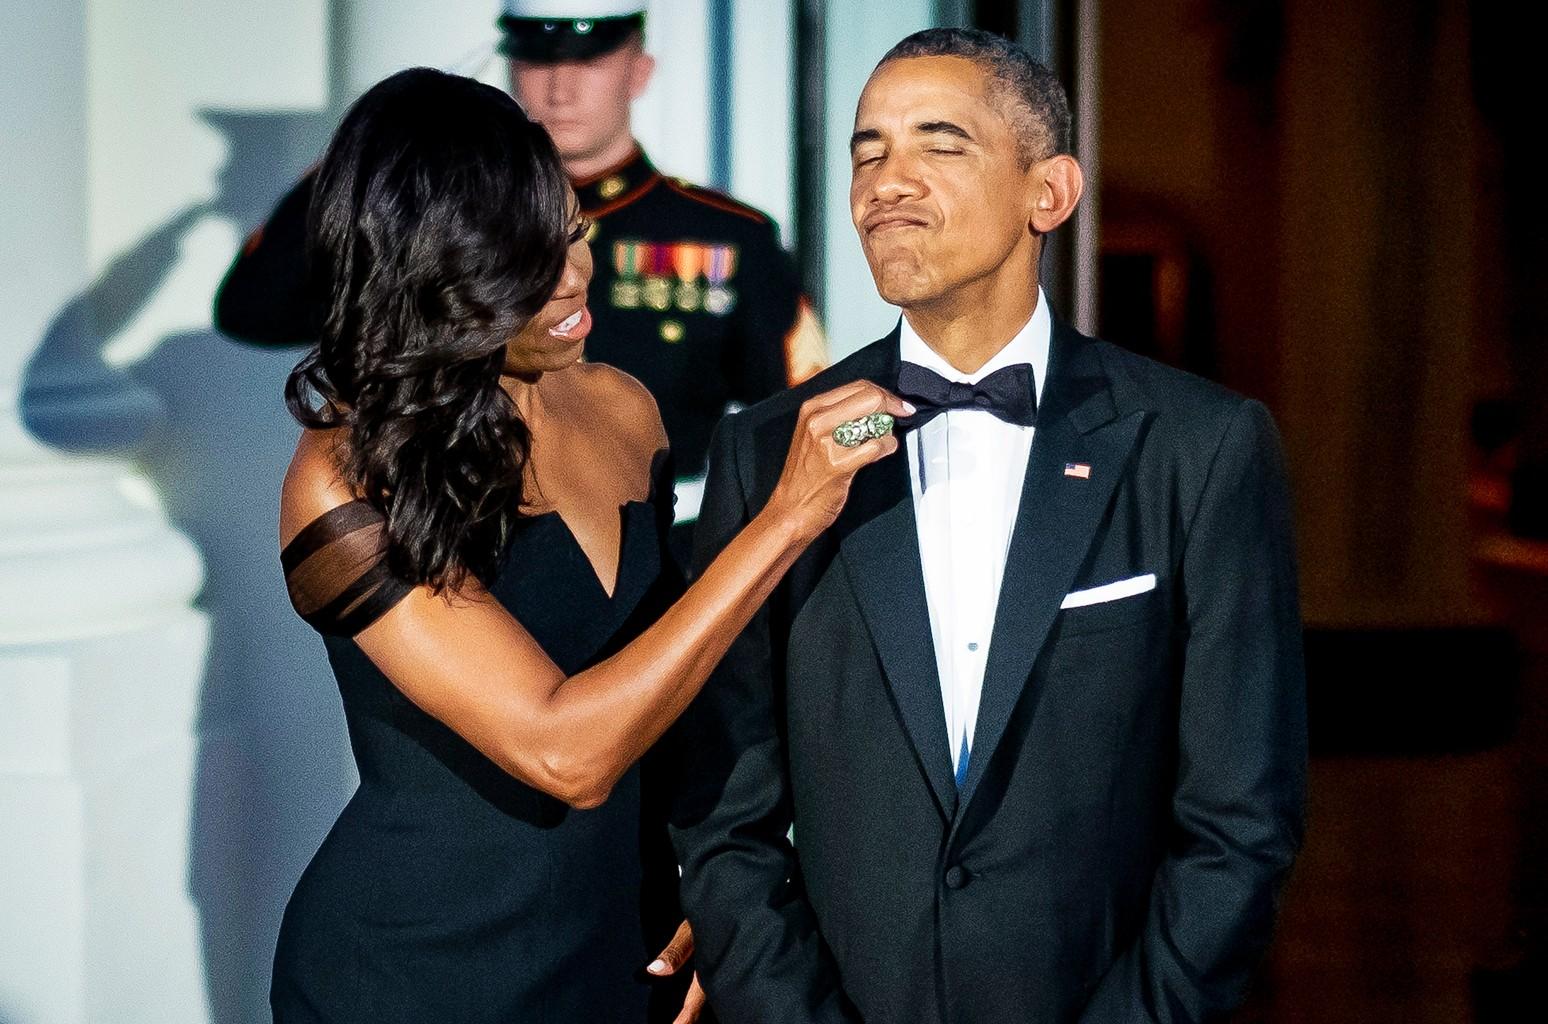 First Lady Michelle Obama & President Barack Obama